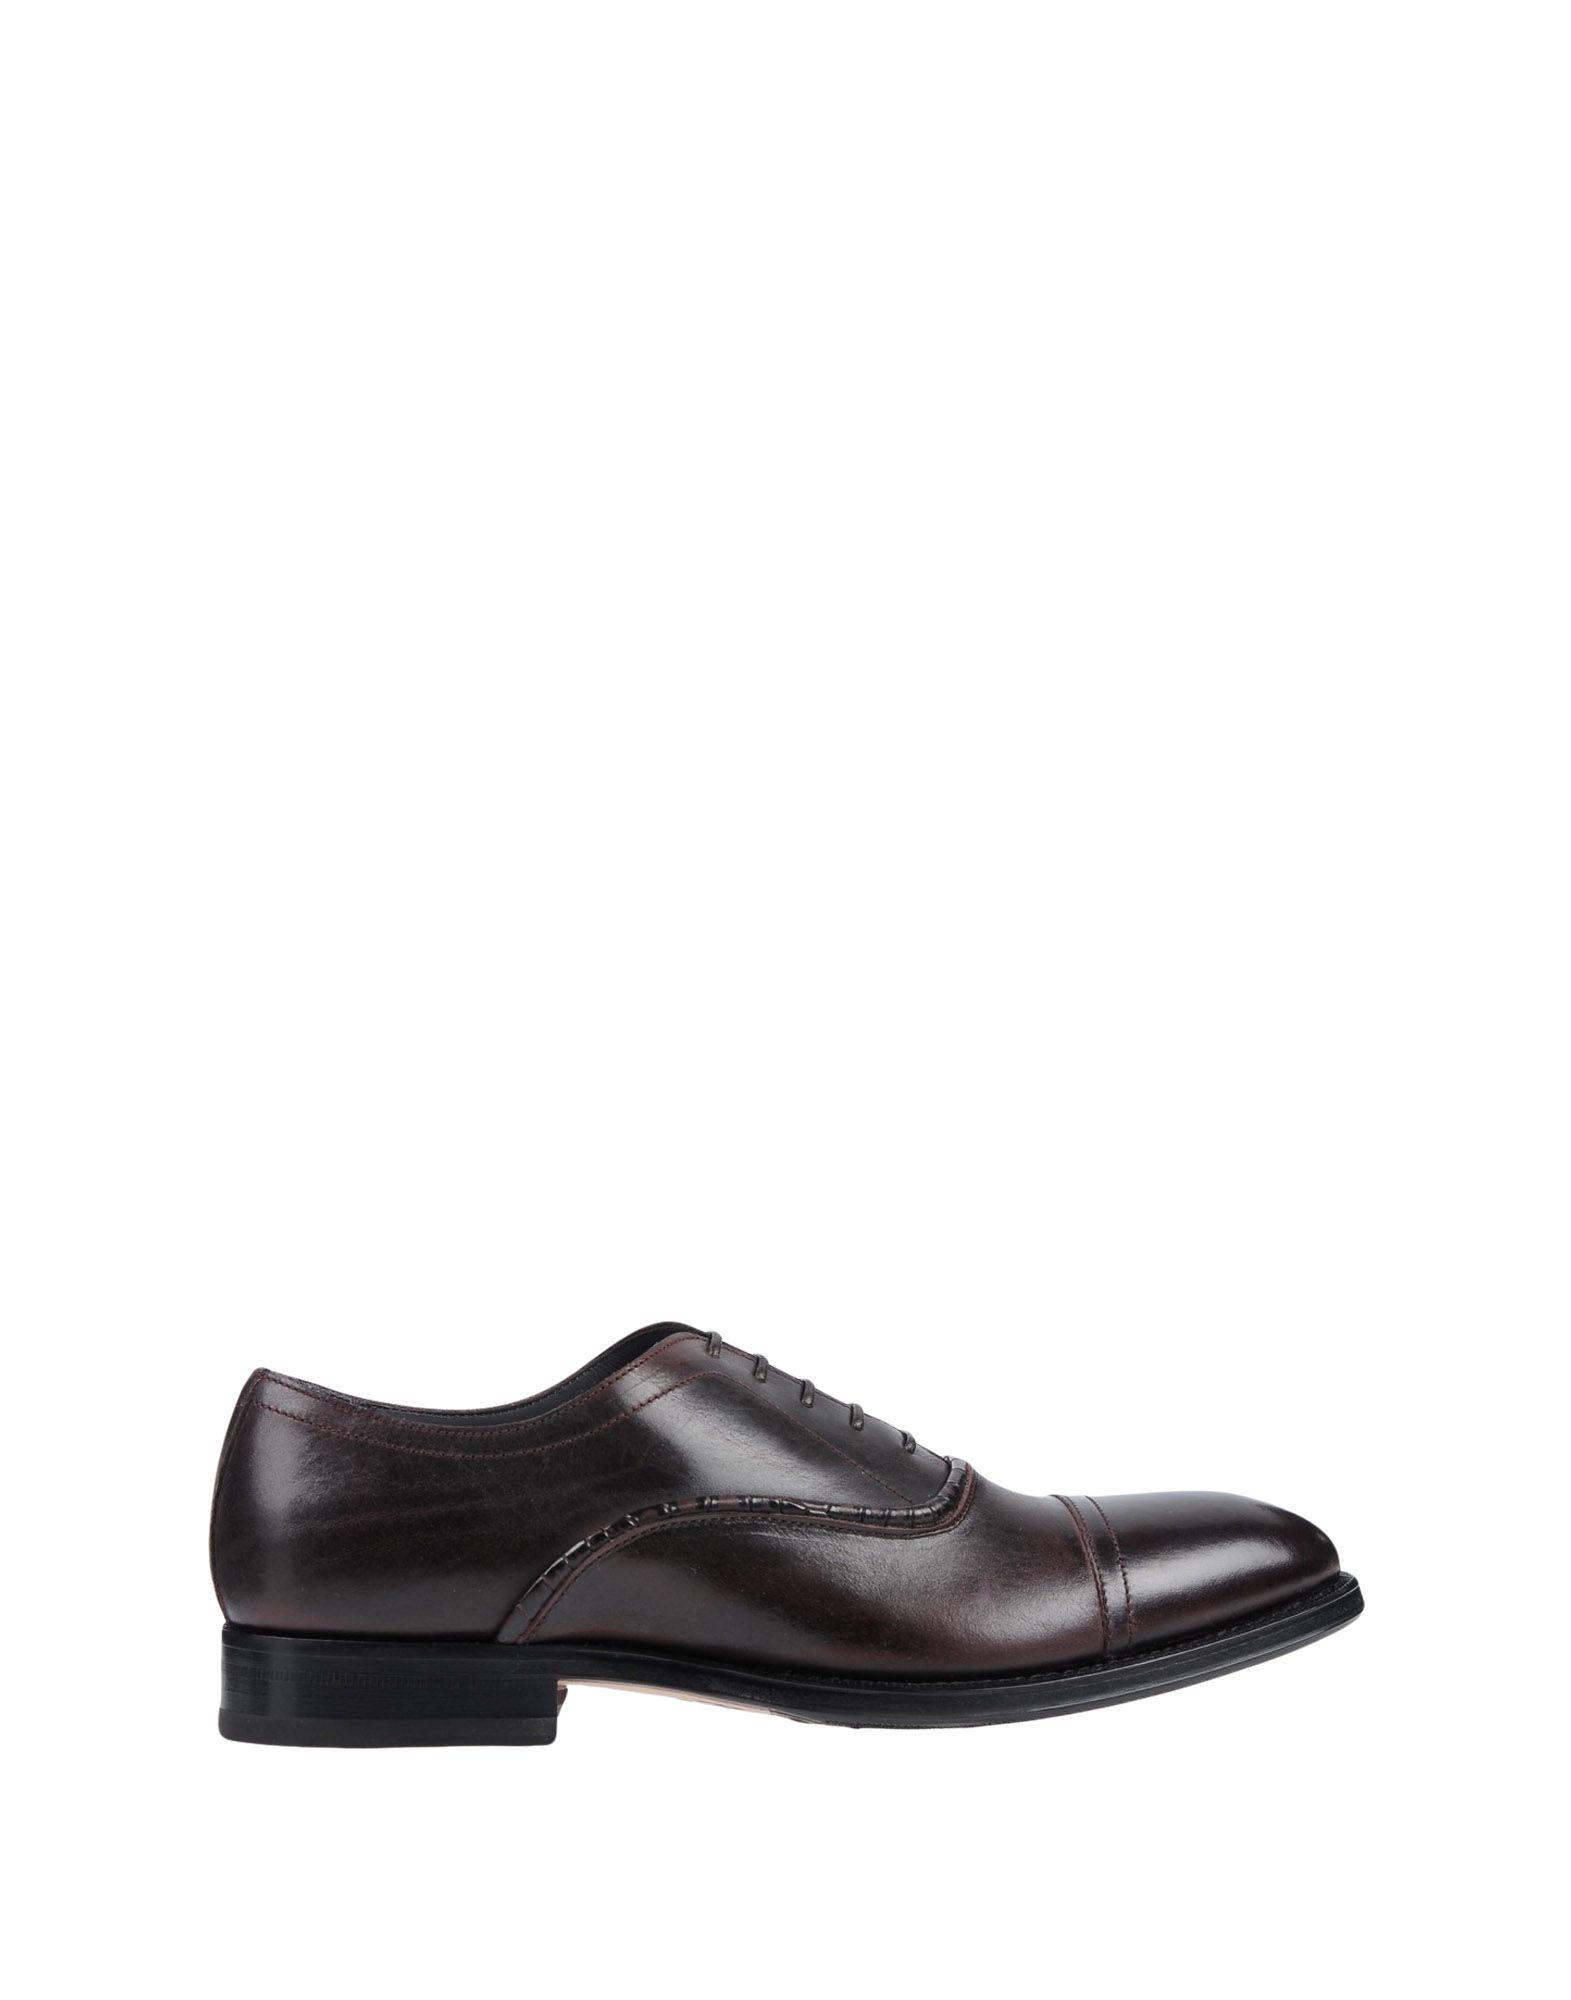 Pollini 11448295AF Schnürschuhe Herren  11448295AF Pollini Gute Qualität beliebte Schuhe 4a8e17